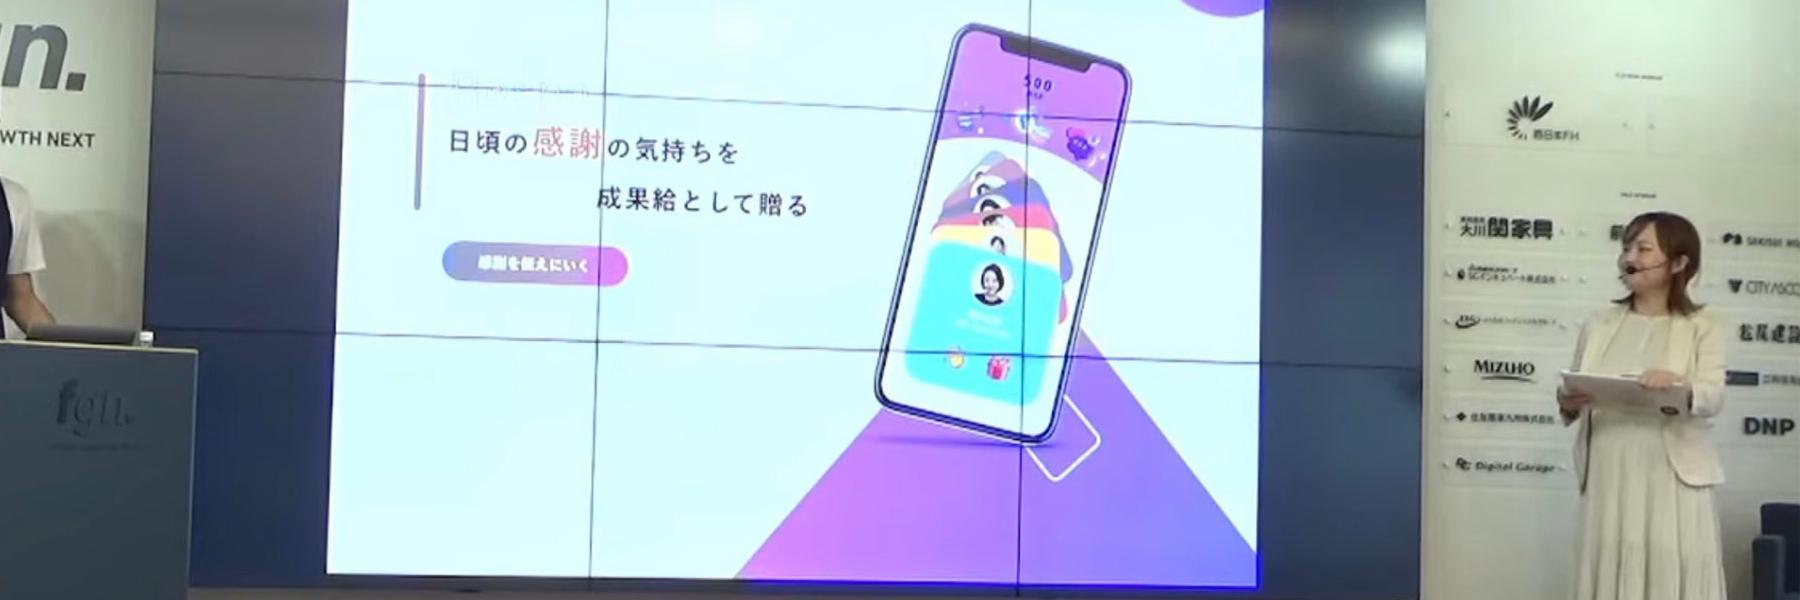 ORYUMON ONLINE 2021 司会の平野綾菜